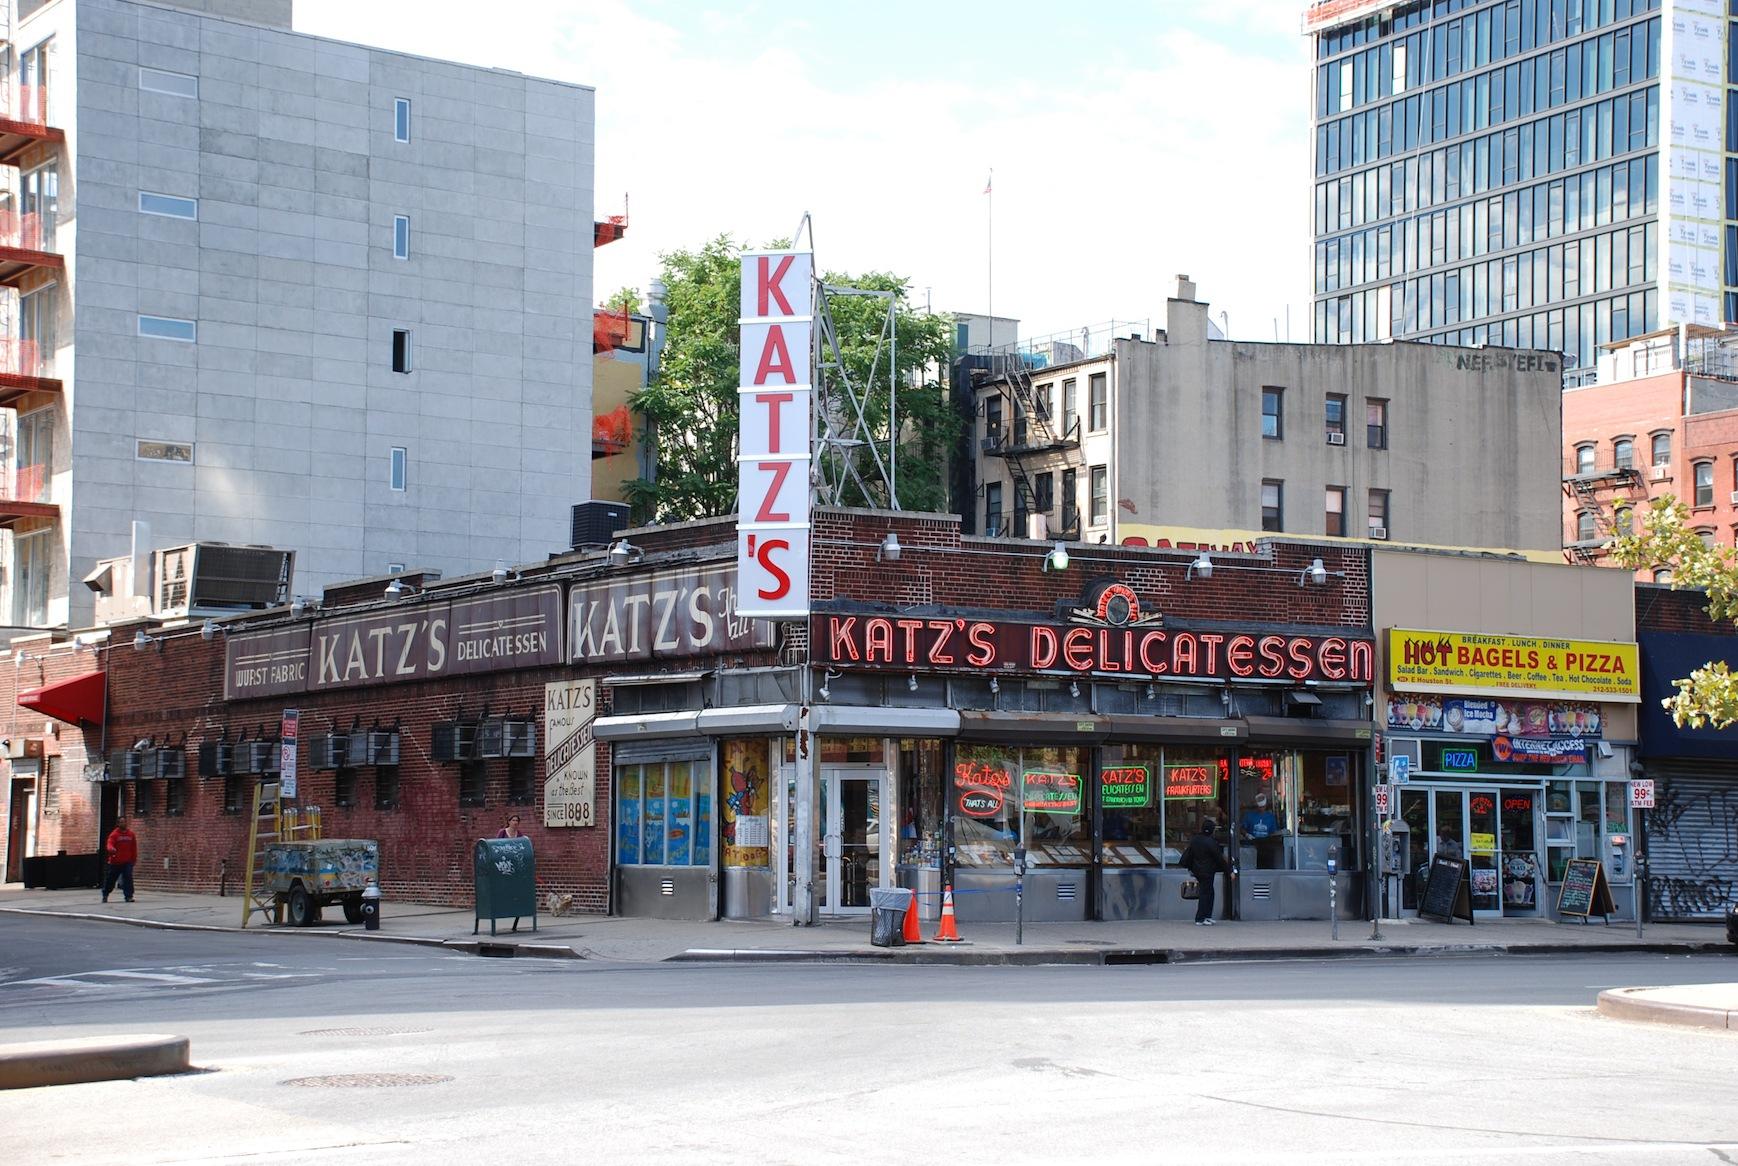 Famous Katz's Delicatessen